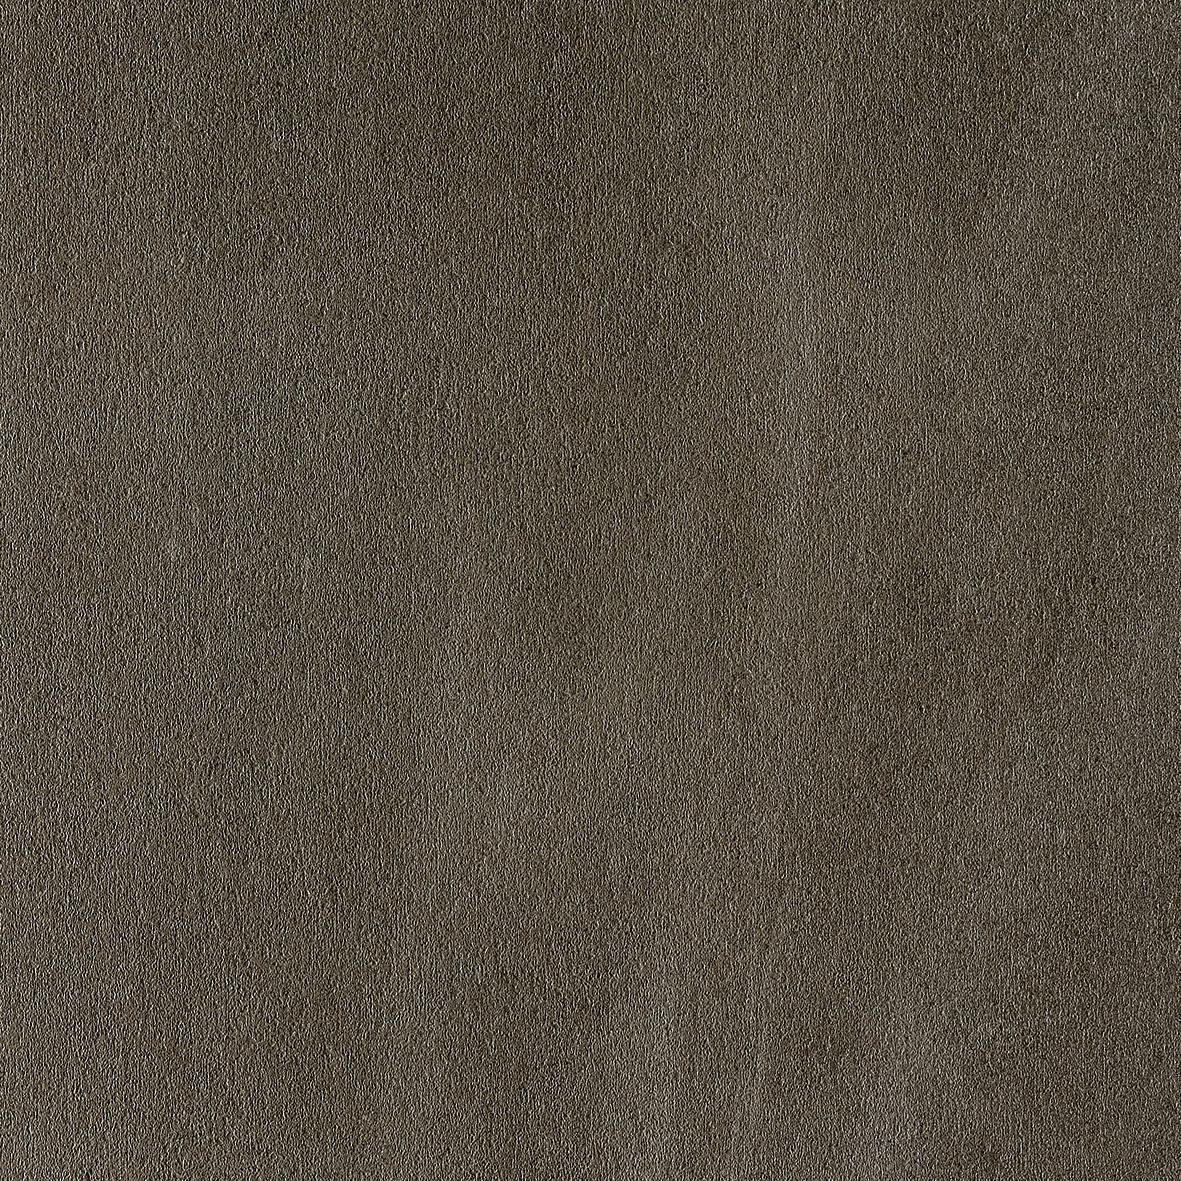 300x600mm Compass Dark Antracite R11 Certified Glazed Porcelain Tile (#5023)